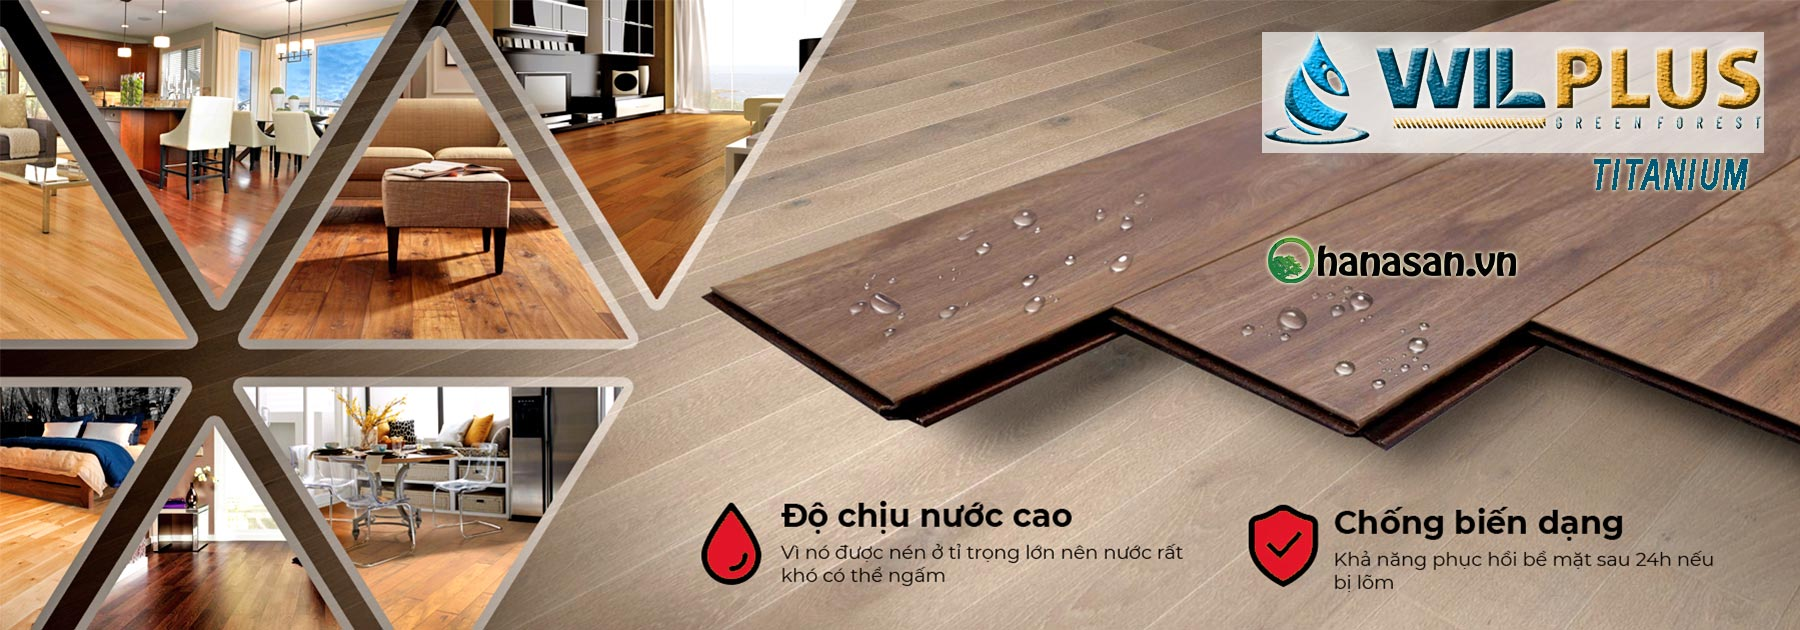 danh mục sàn gỗ wilplus titanium